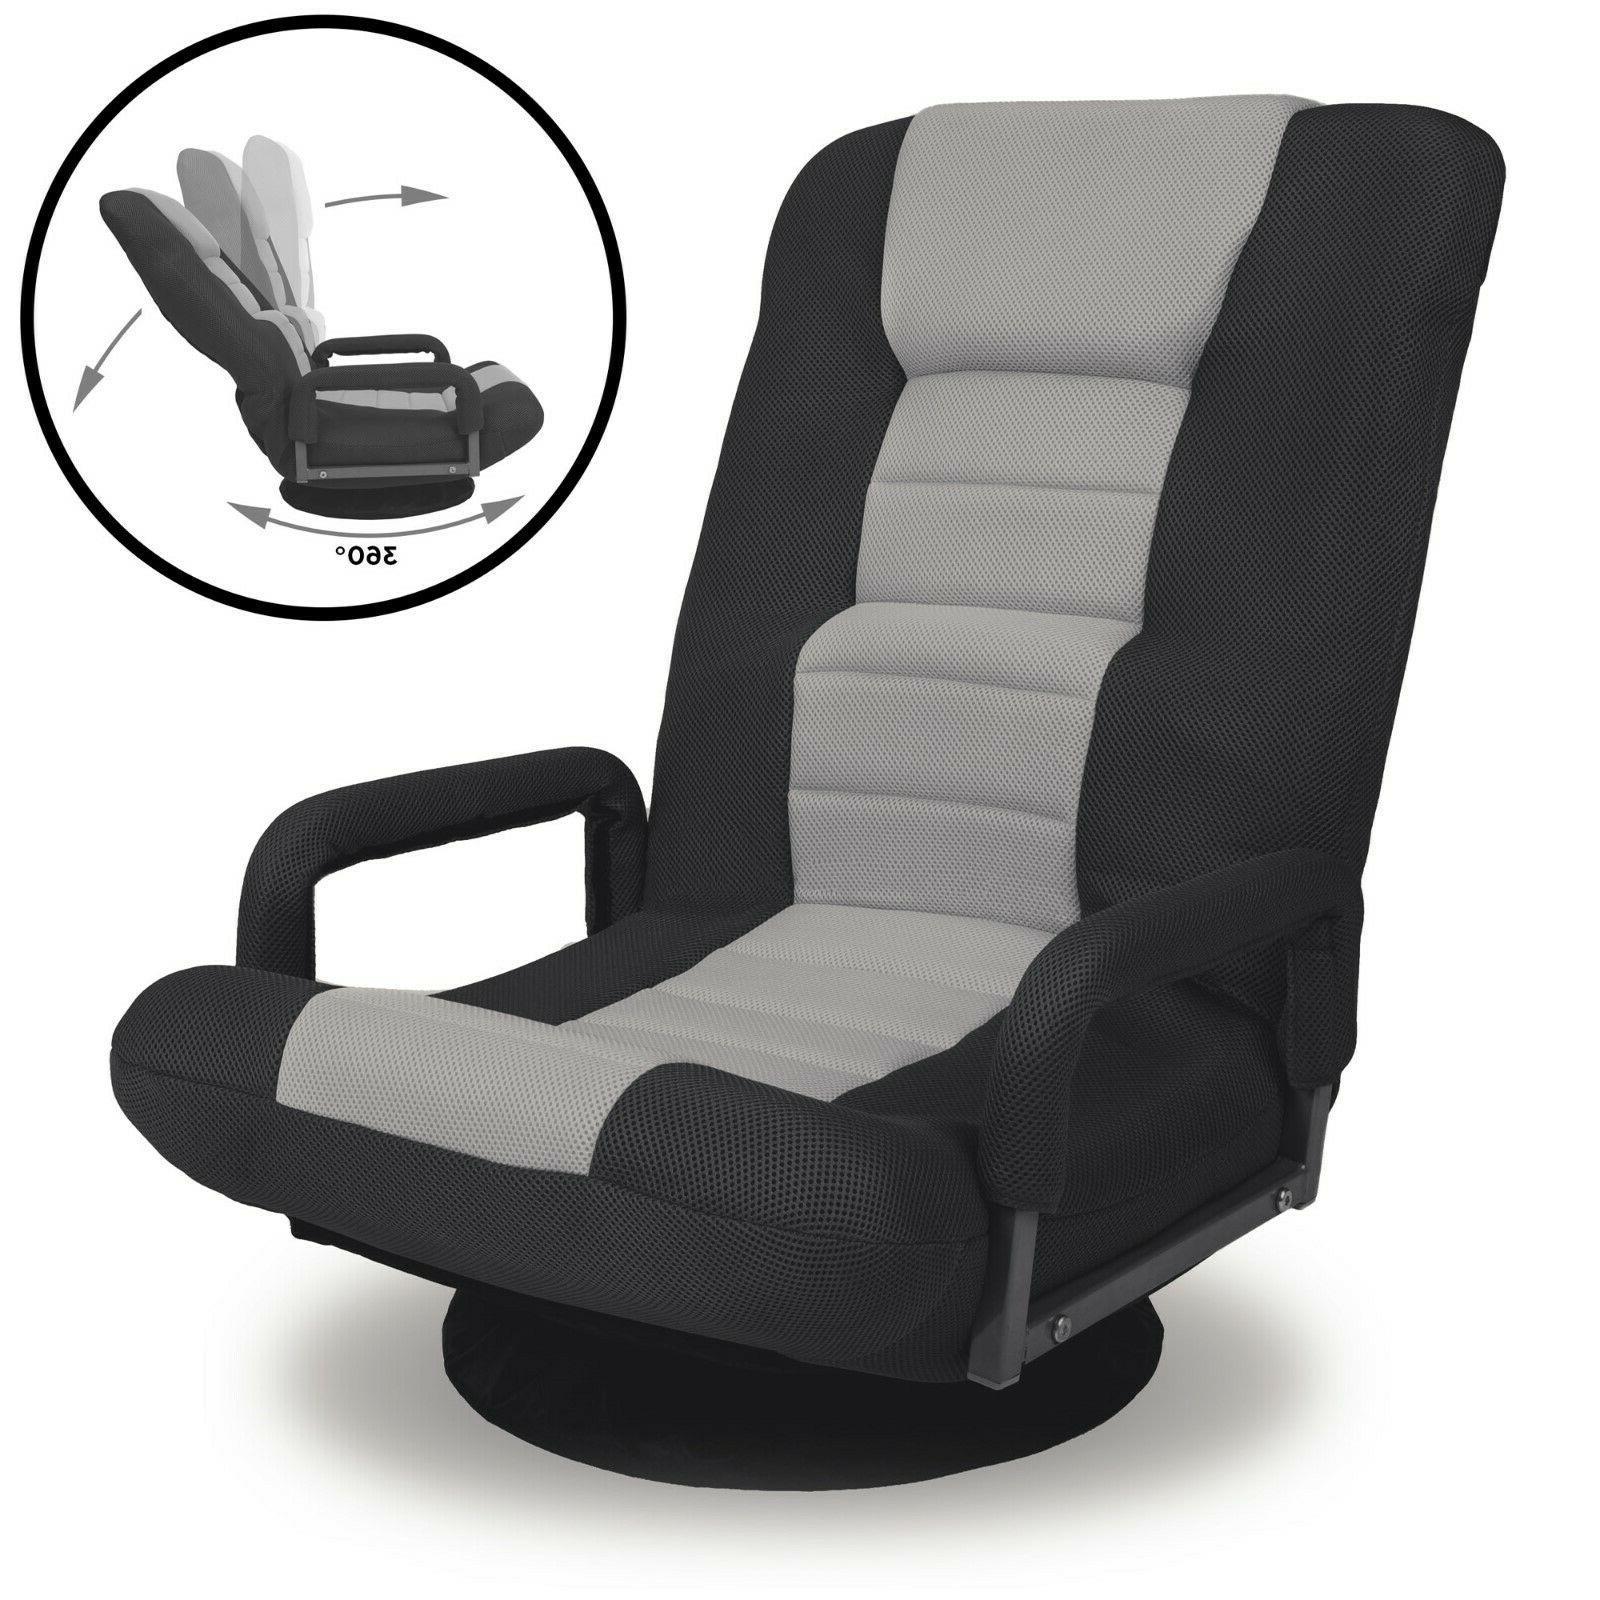 360 degree swivel gaming floor chair w